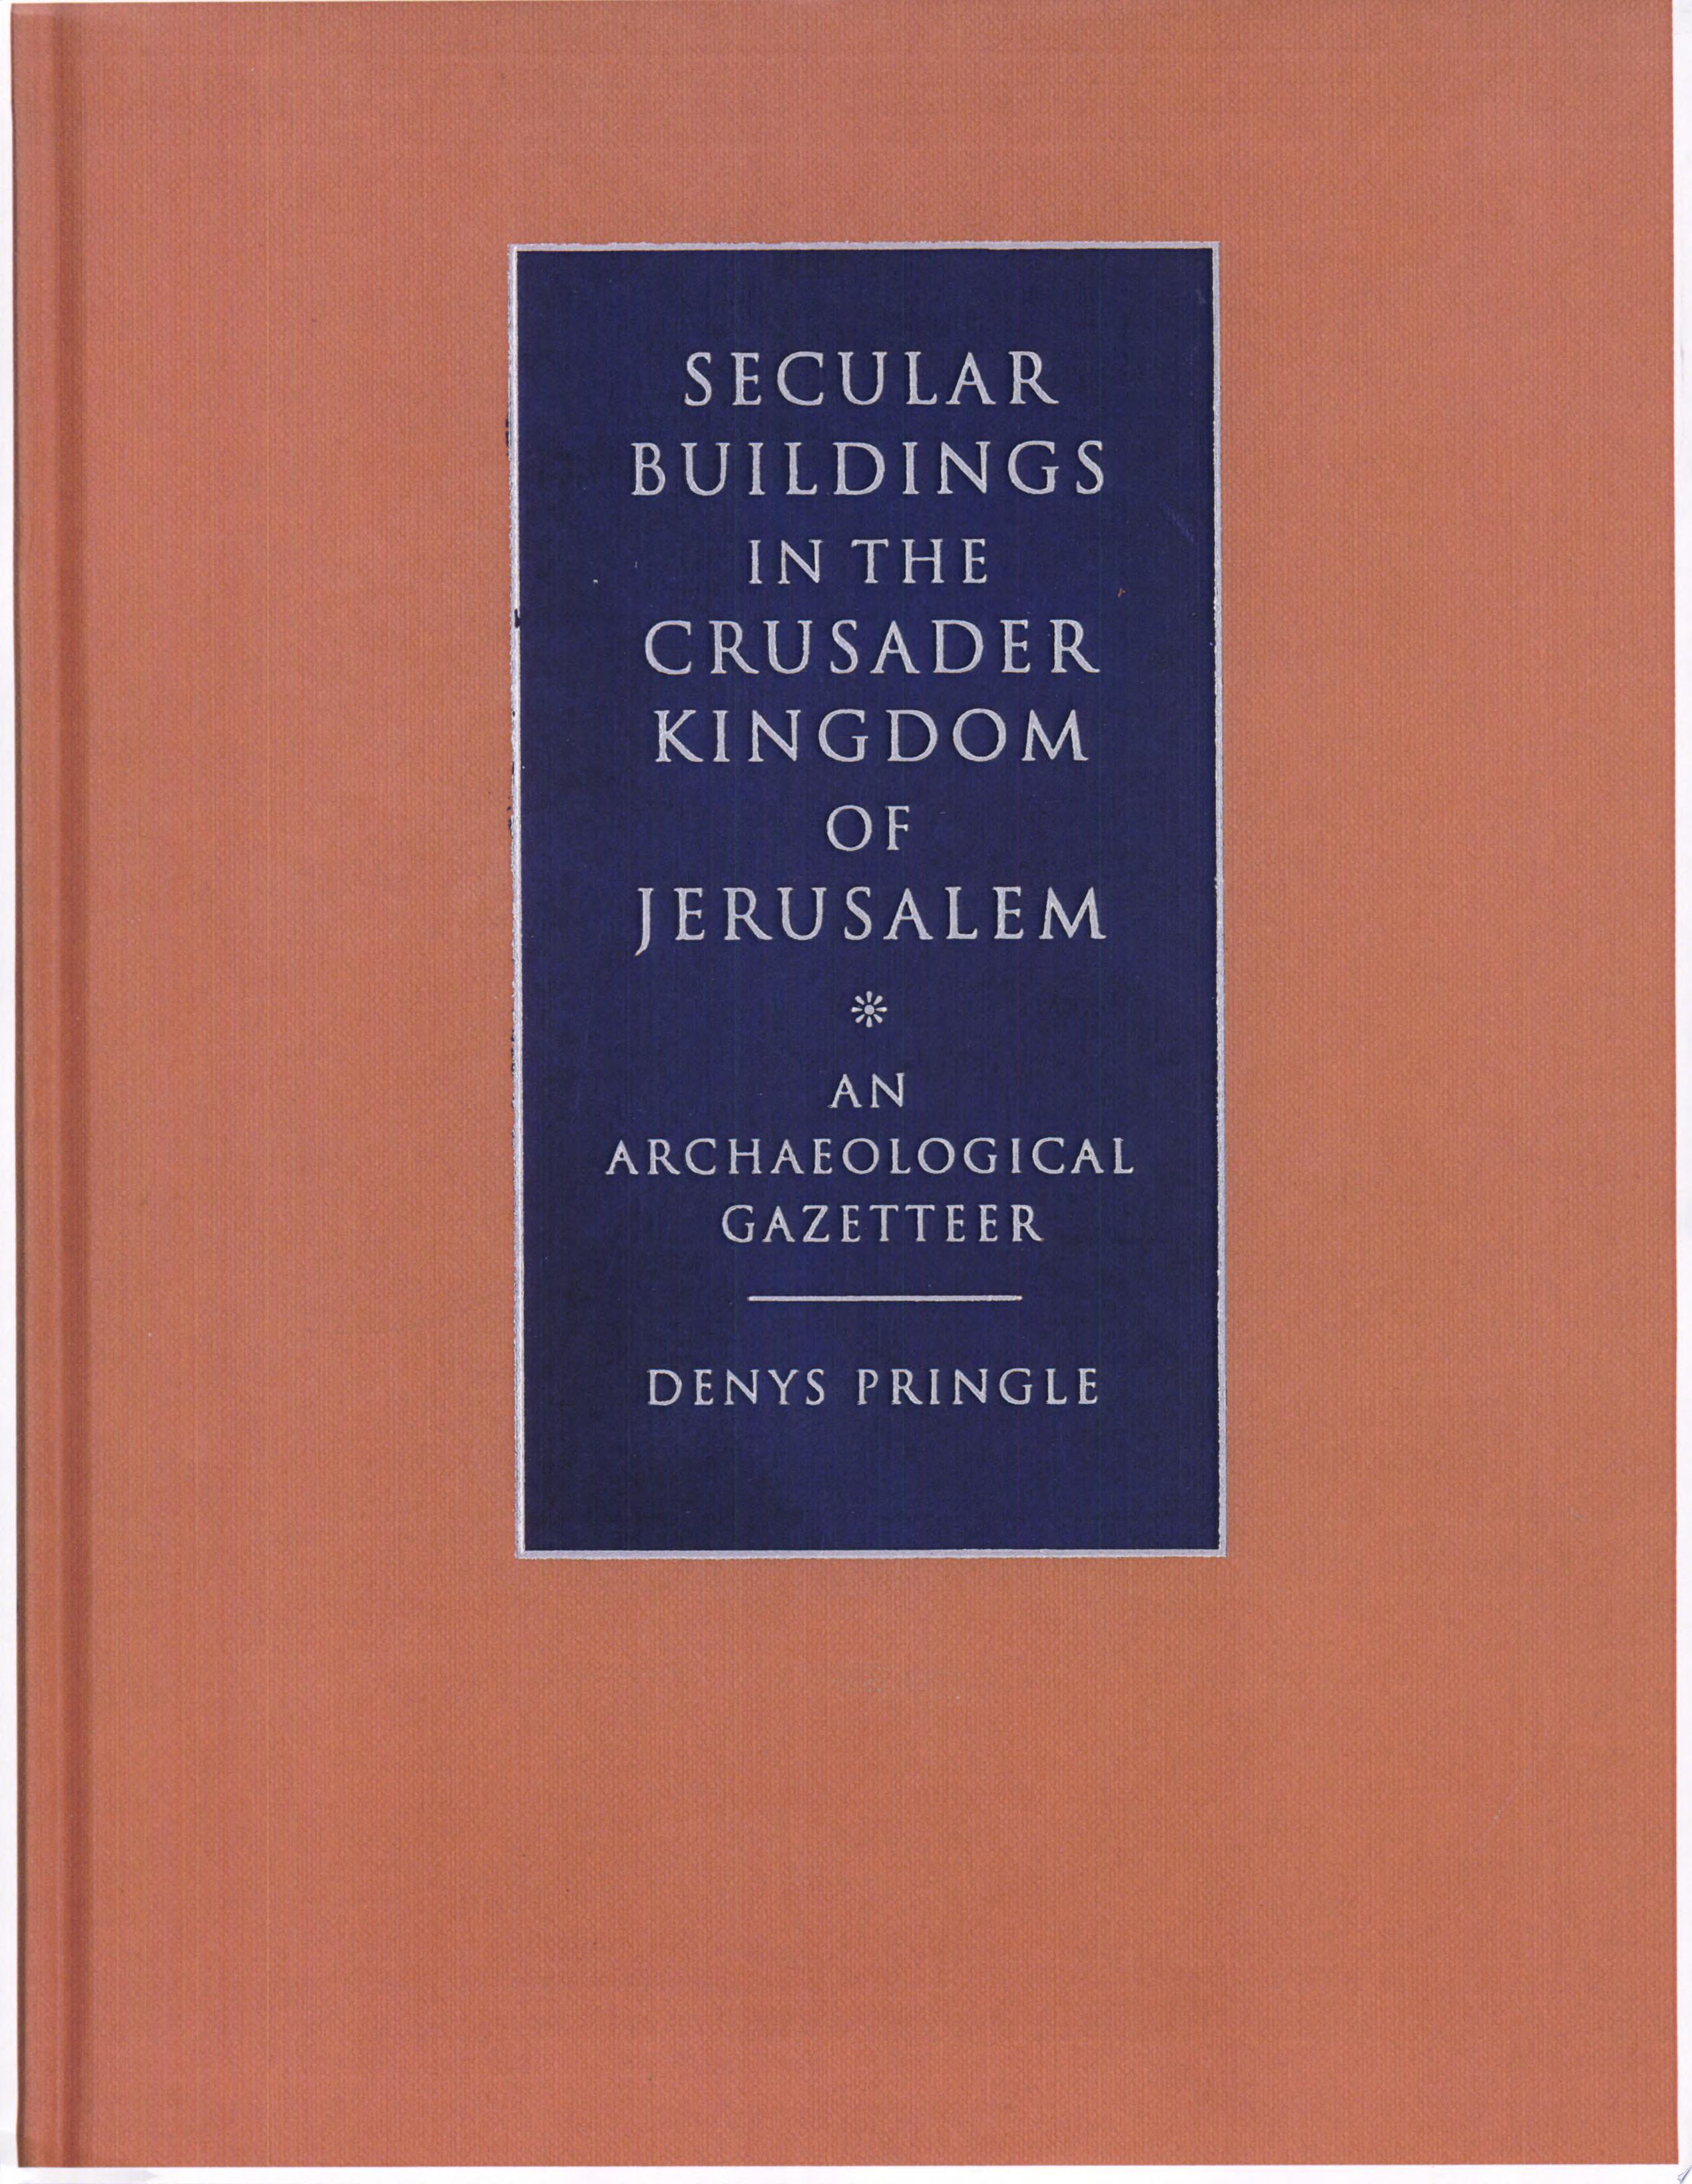 Secular Buildings in the Crusader Kingdom of Jerusalem